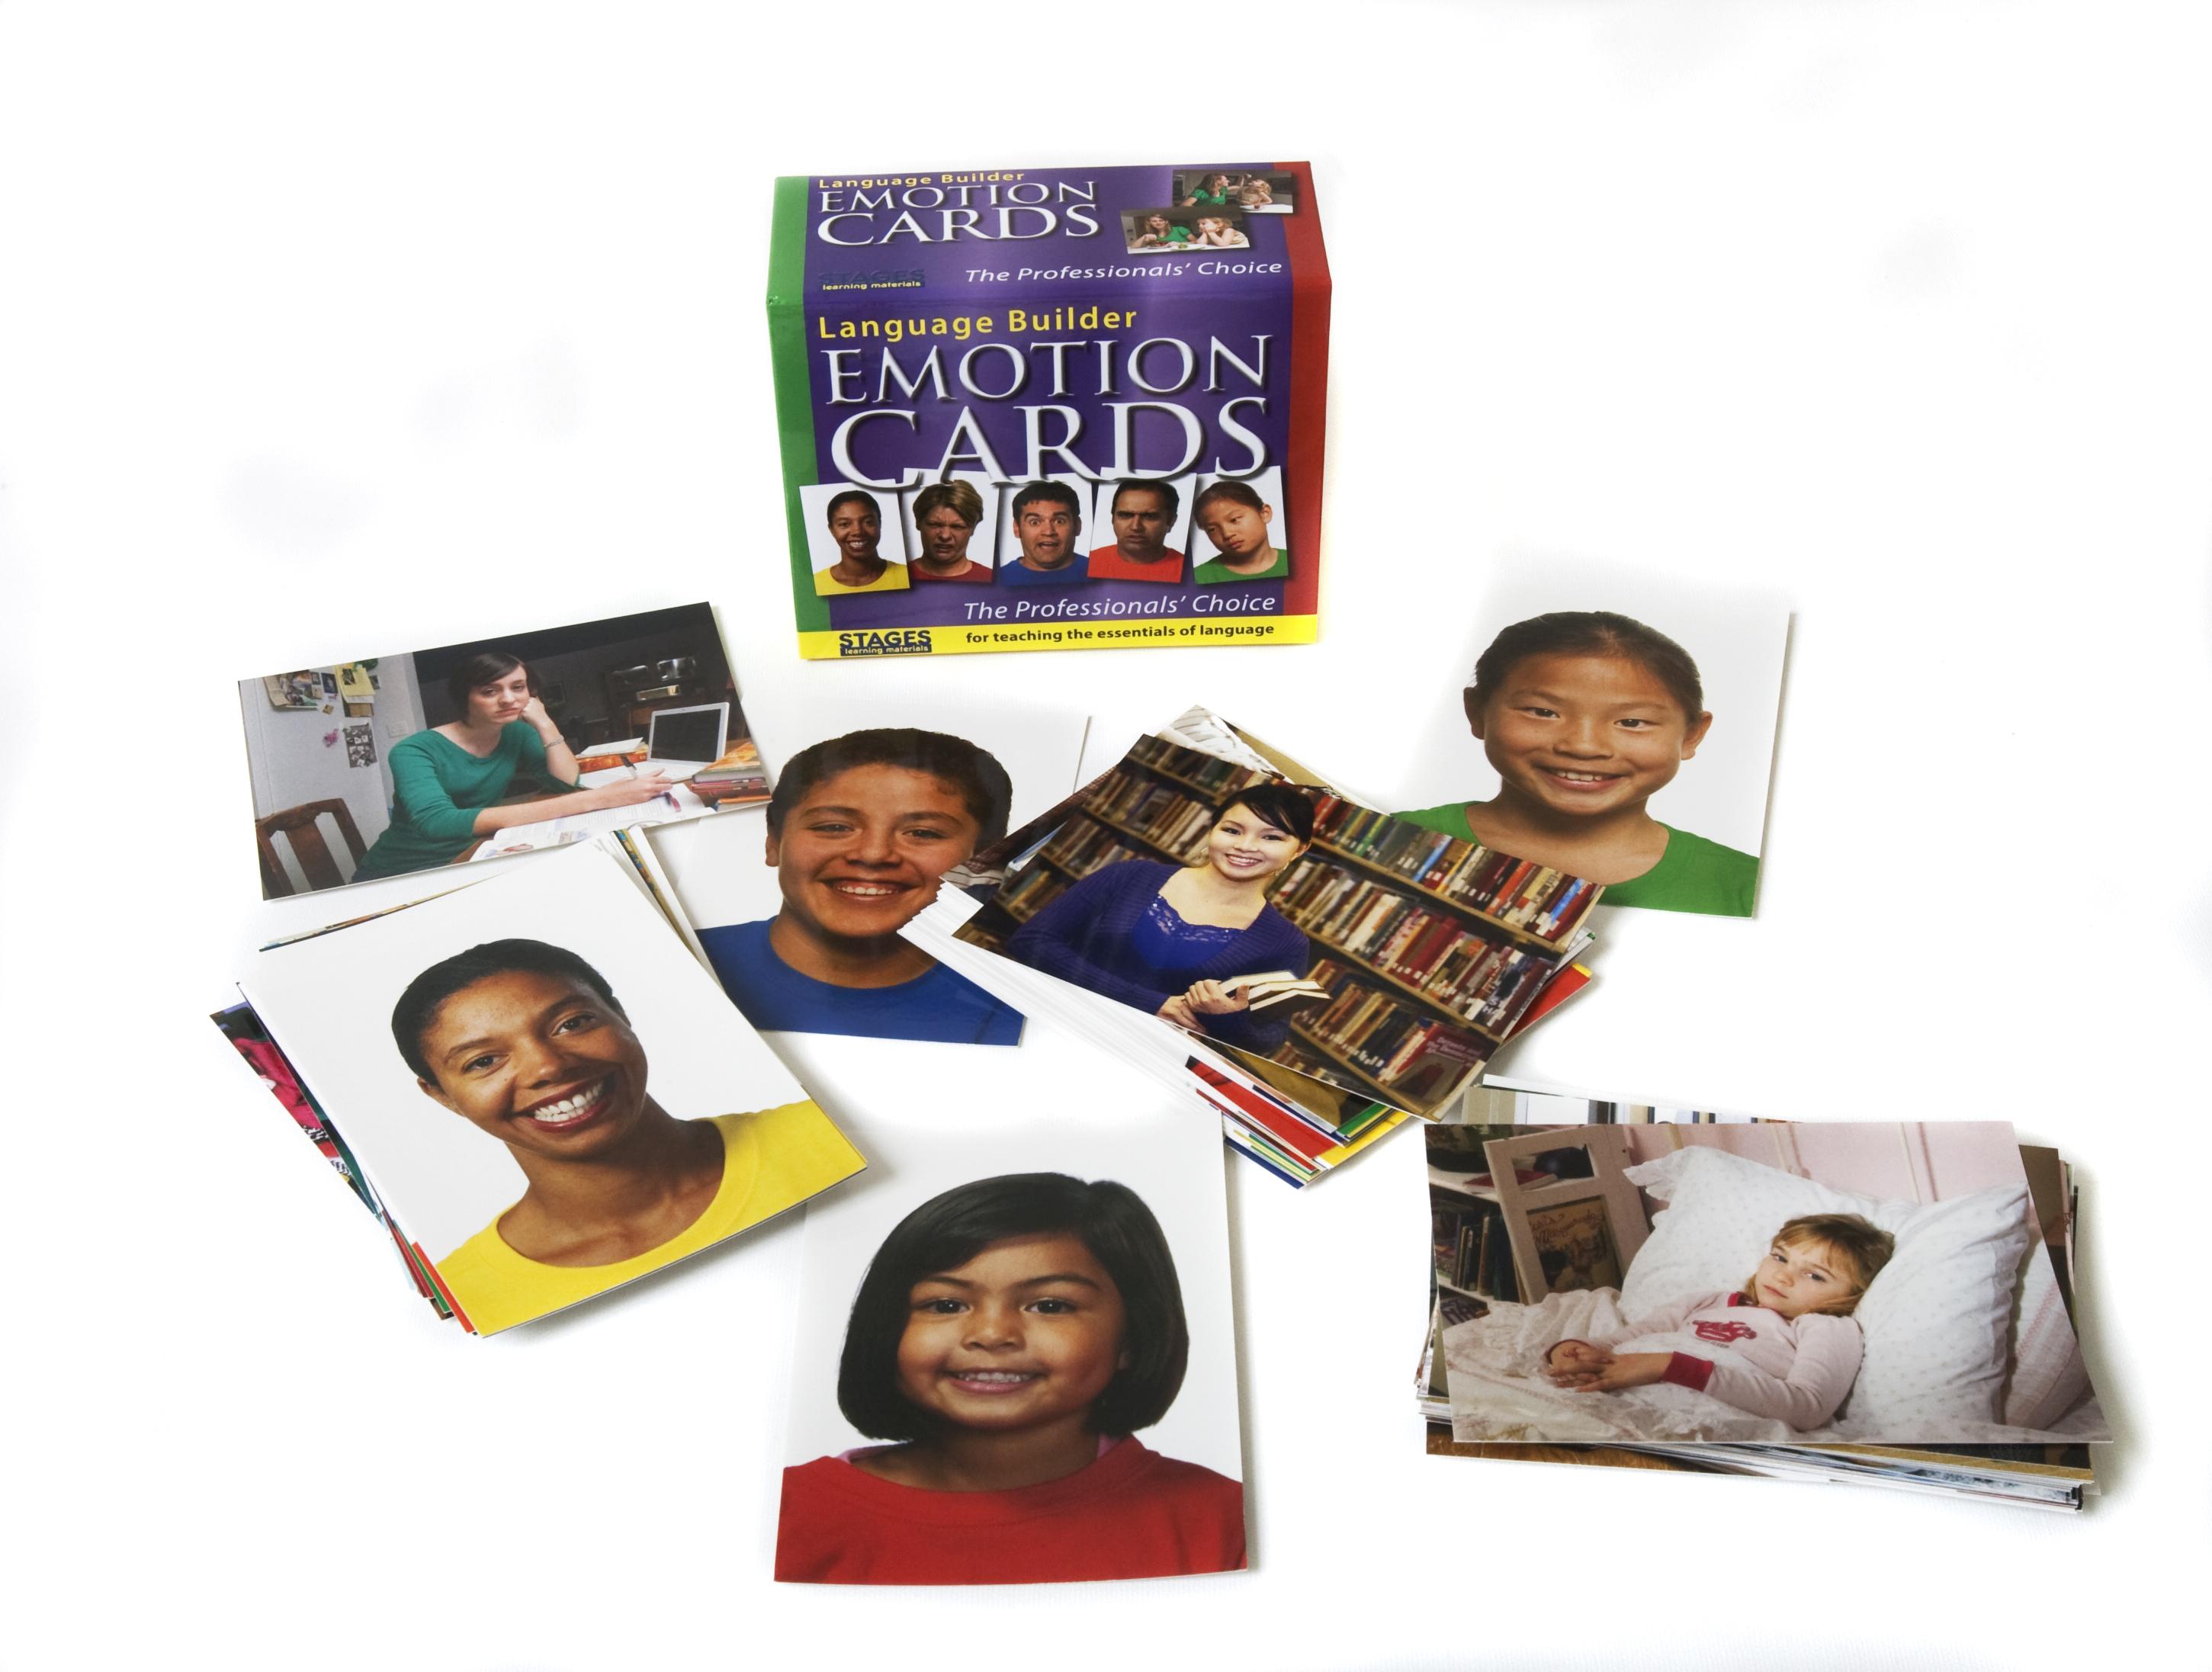 Language Builder Emotion Cards for Autism Education